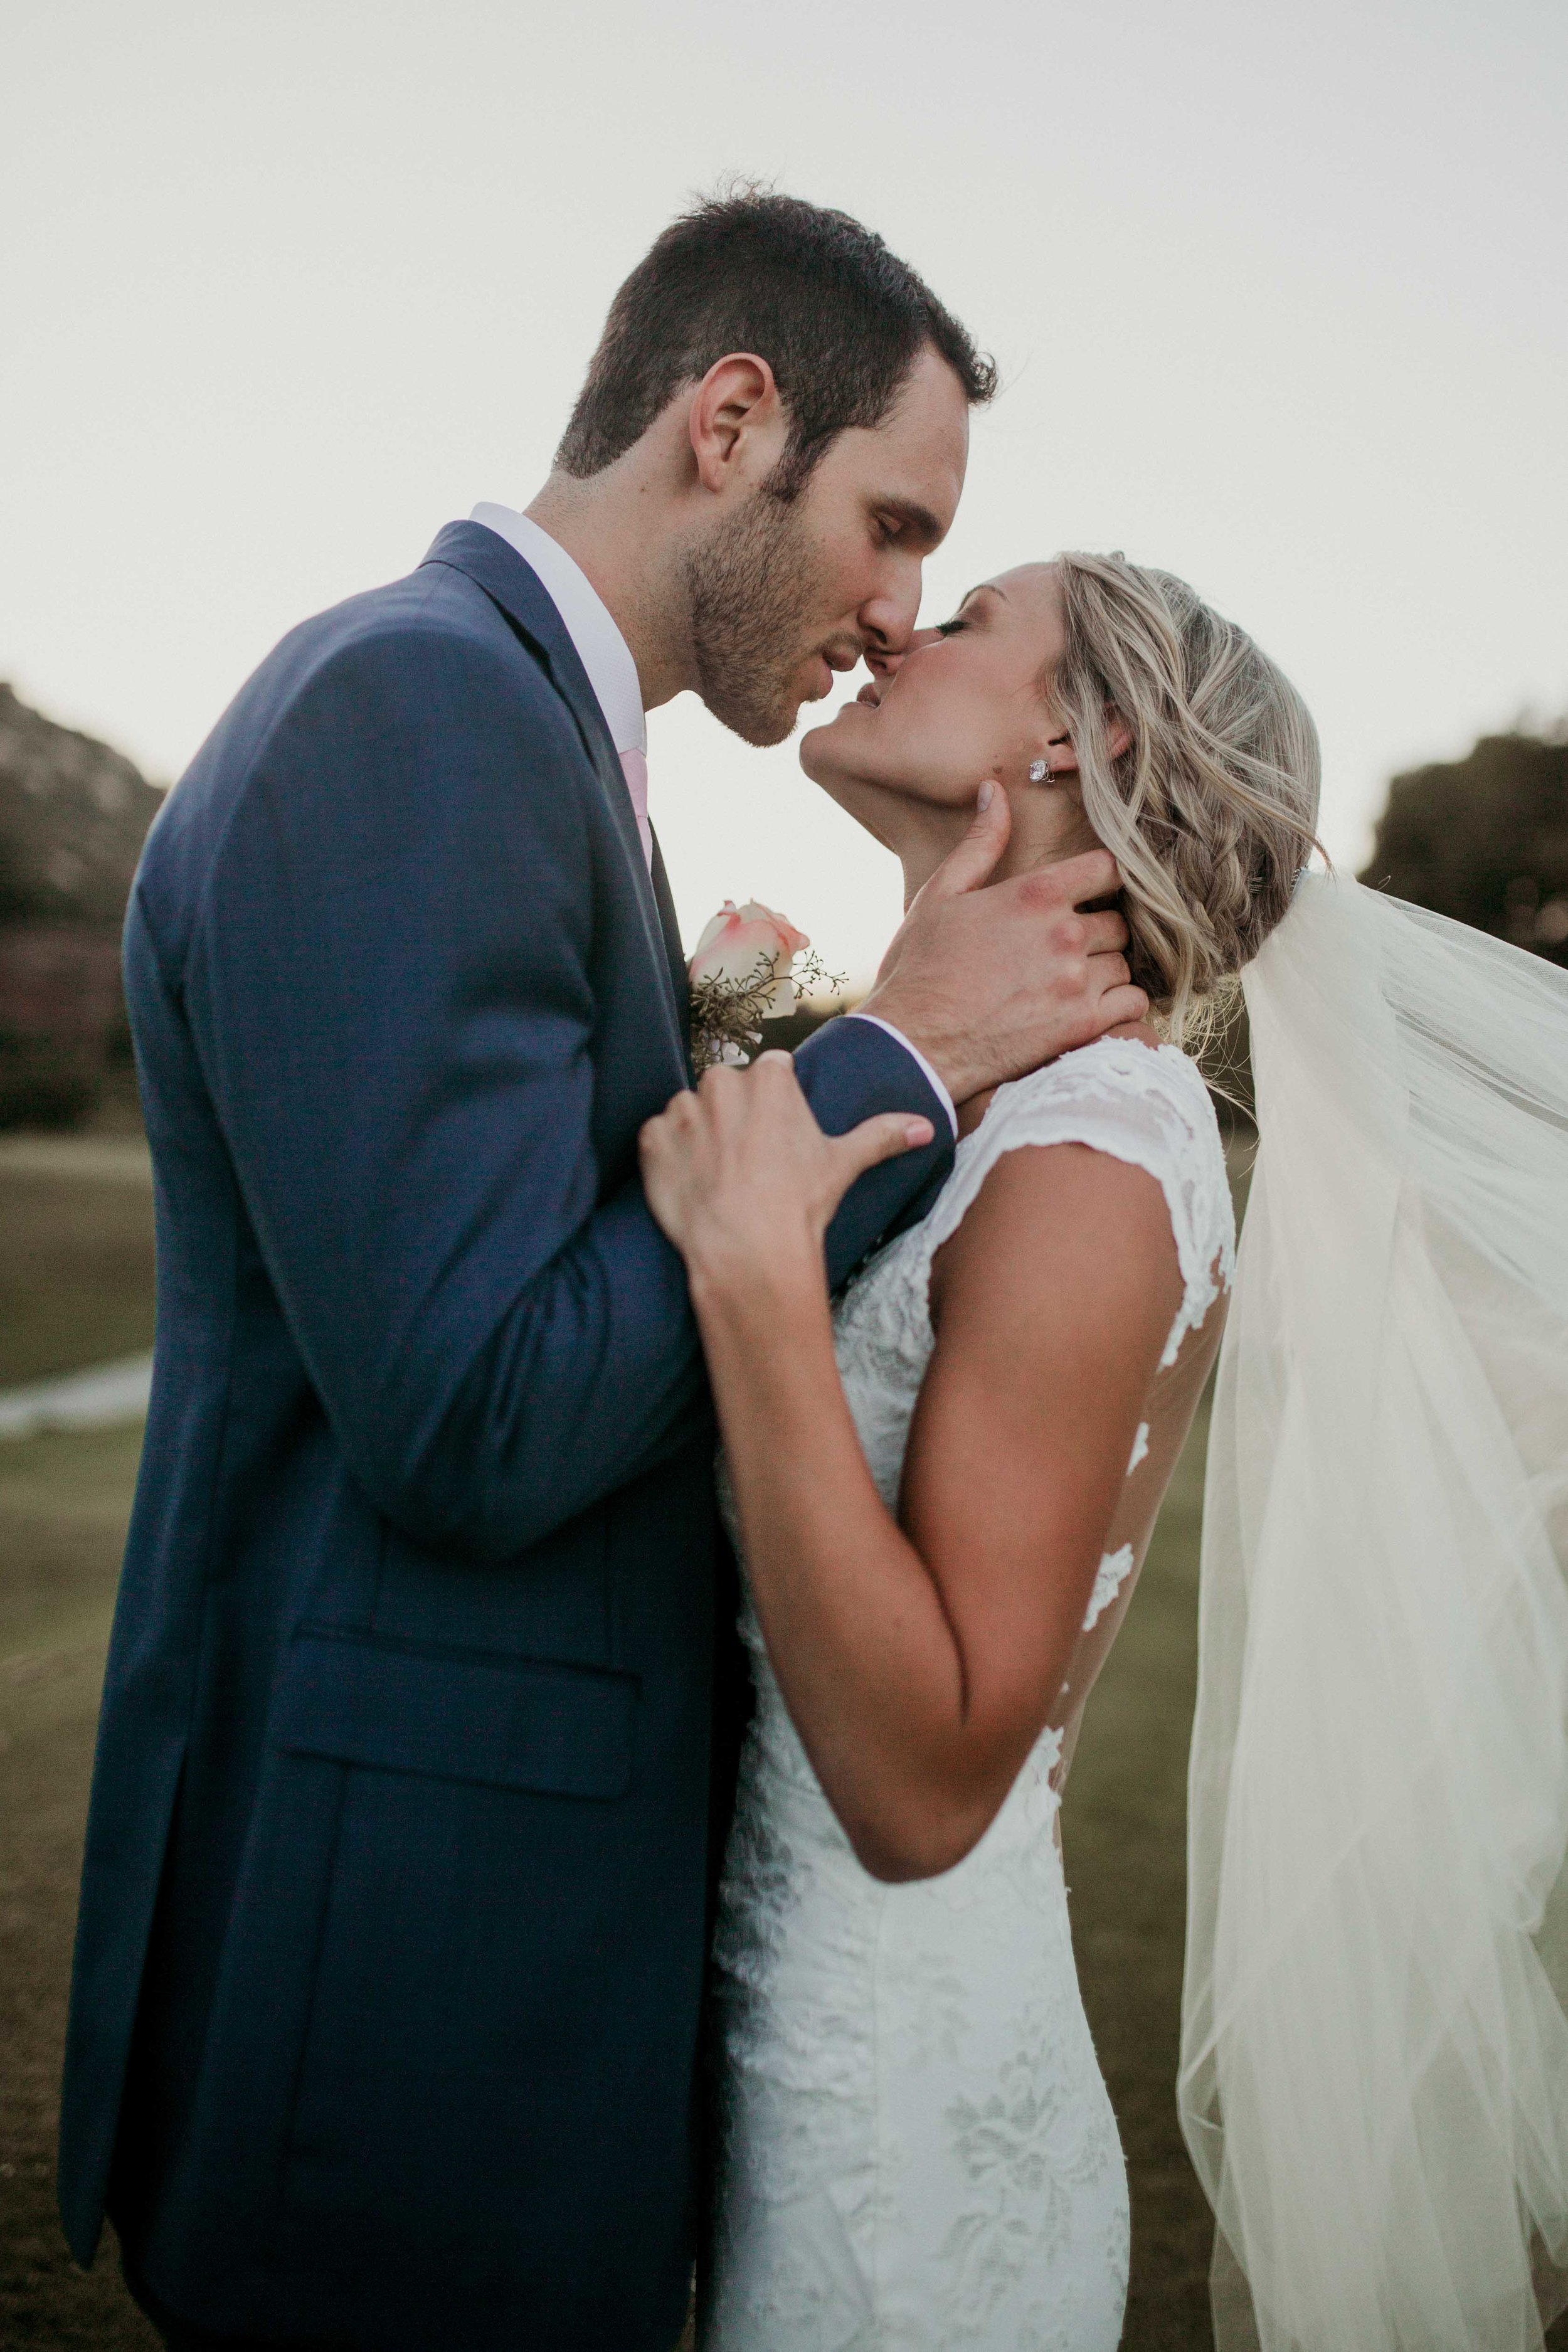 Salt-Lake-City-Wedding-Photographer-43.jpg